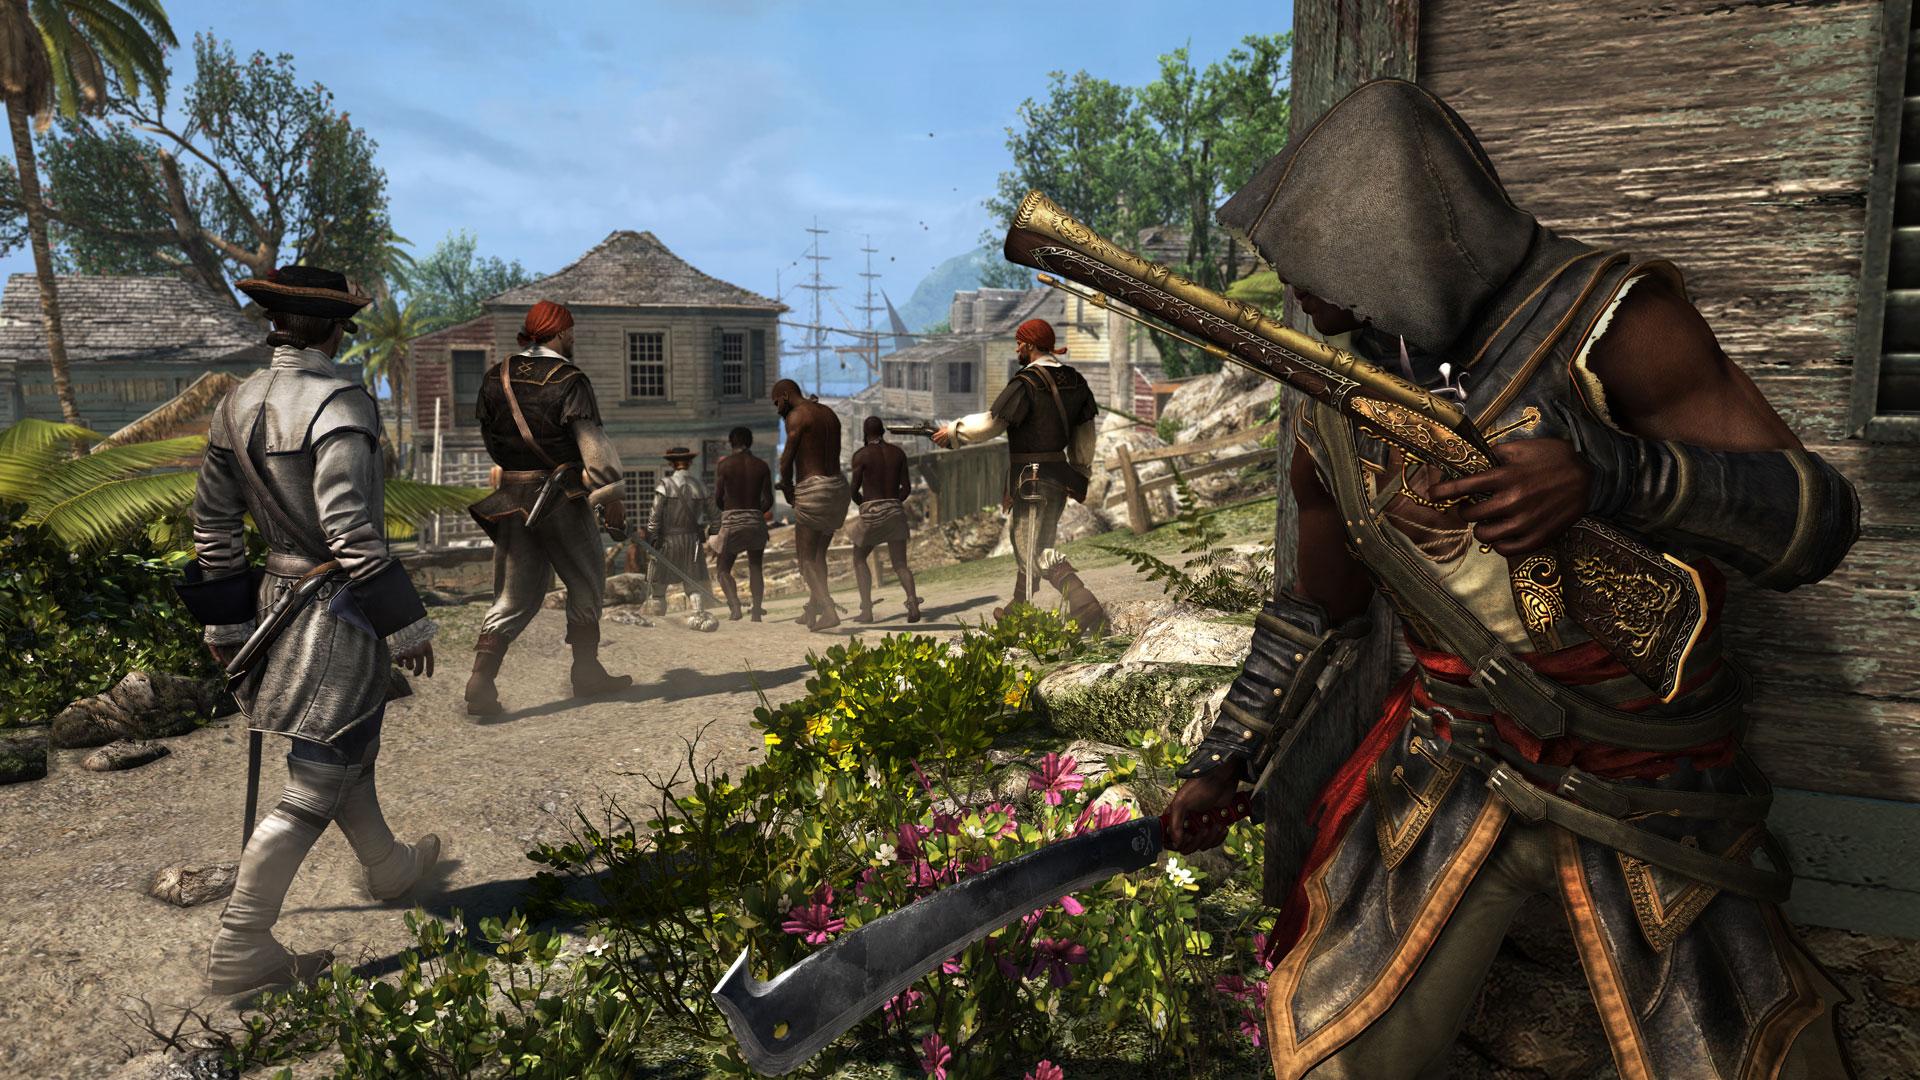 Assassins Creed IV Black Flag [PC][Repack][6.68 GB